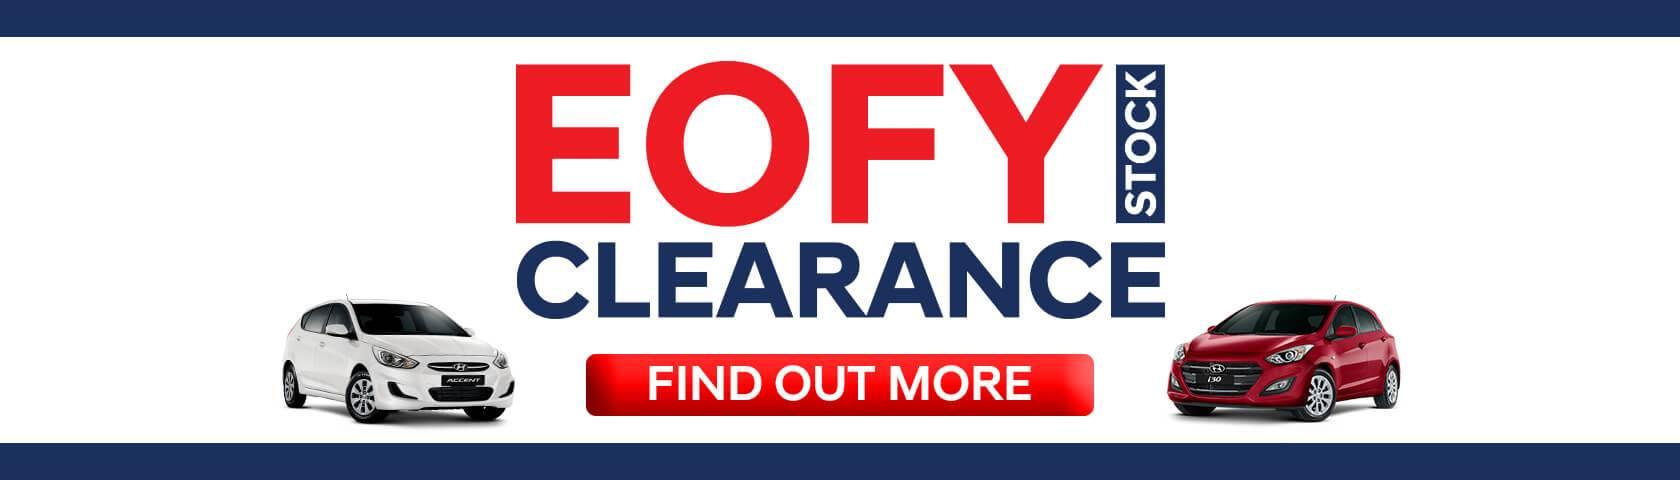 LlewellynHyundai-EOFY Clearance